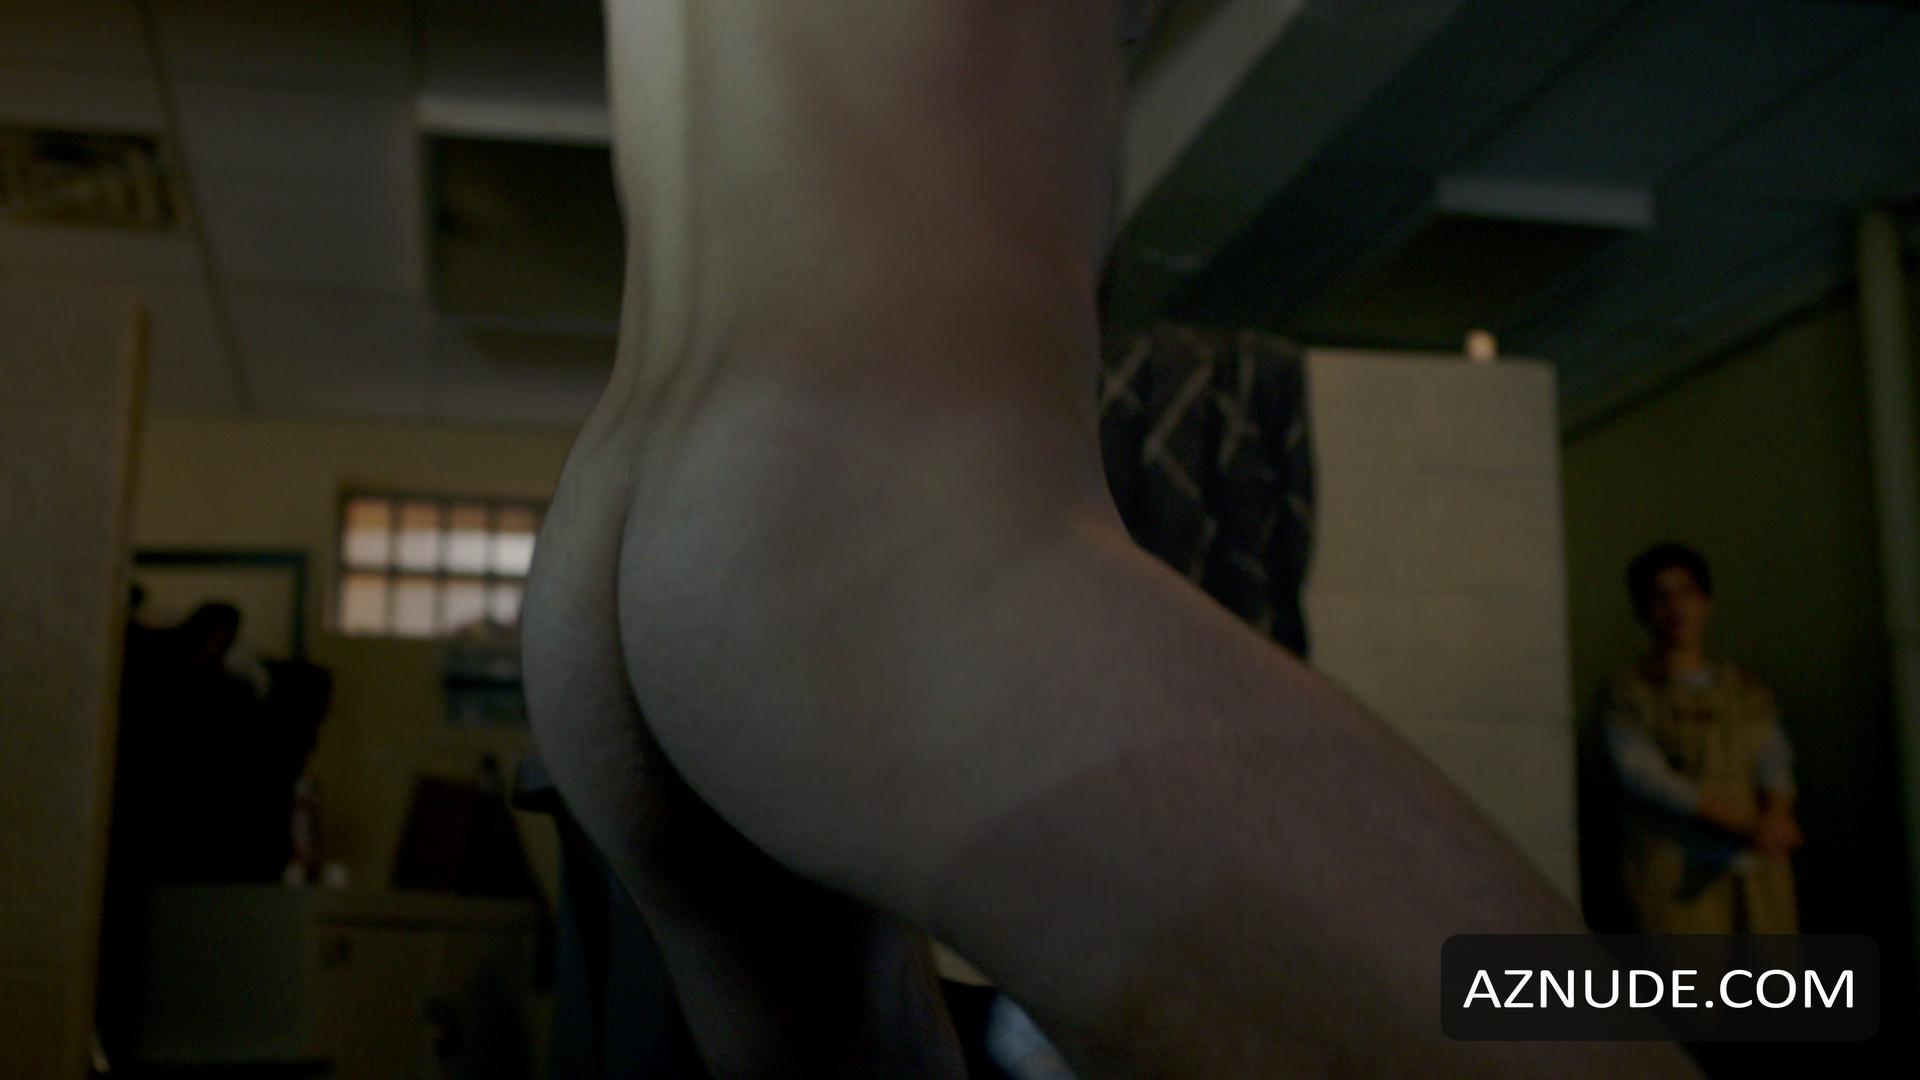 American Pie Reunion Nude Scene  Hot Girl Hd Wallpaper-9563